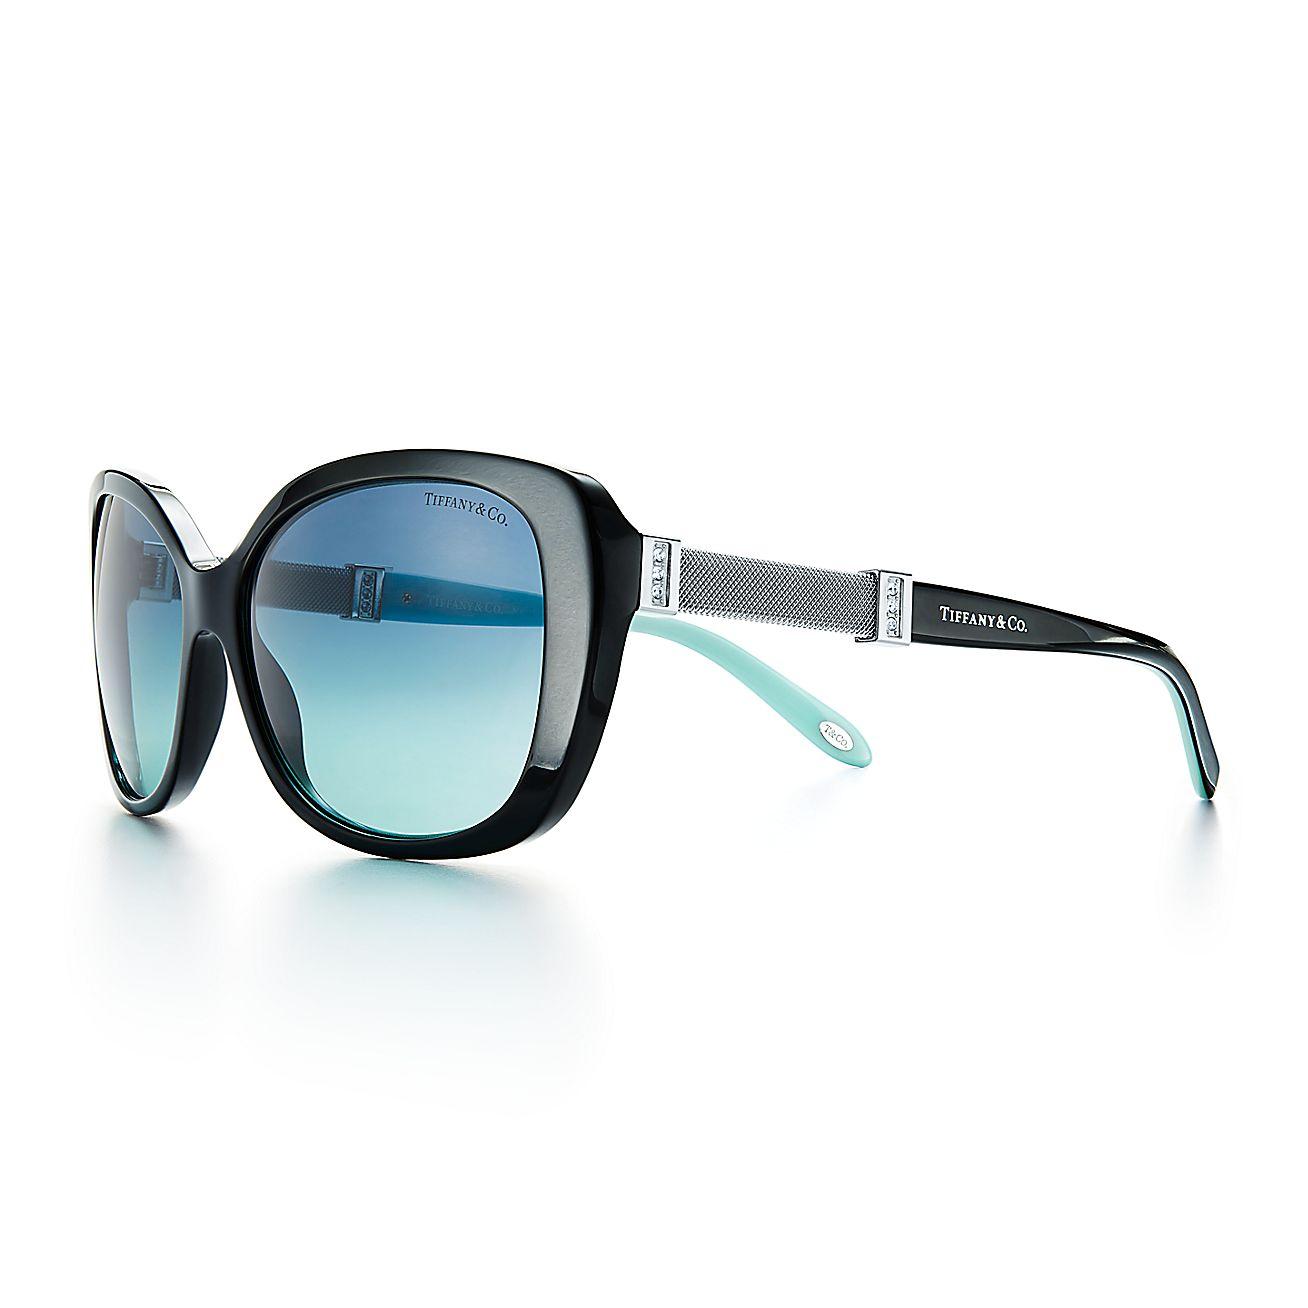 630e50abb615 Cat Eye Sunglasses Tiffany